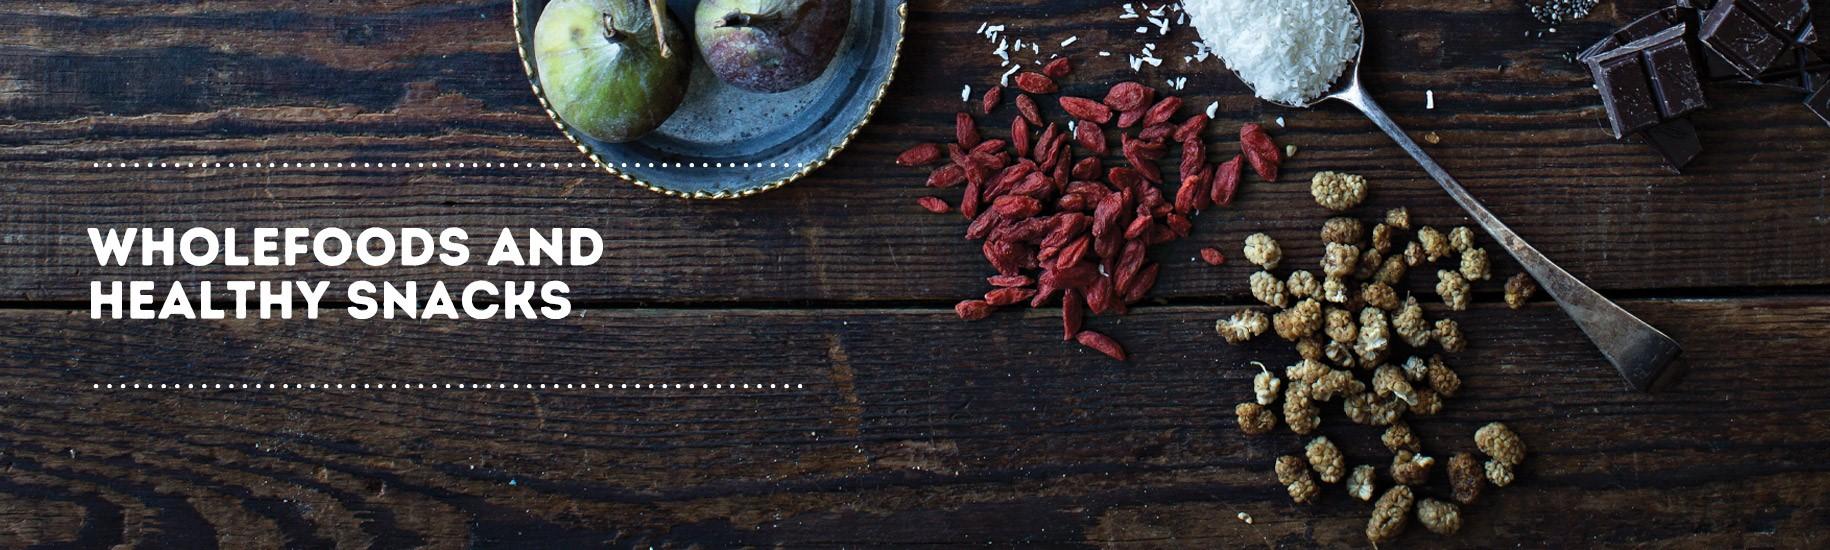 Nourish Wholefoods Pantry Essentials Food & Drink